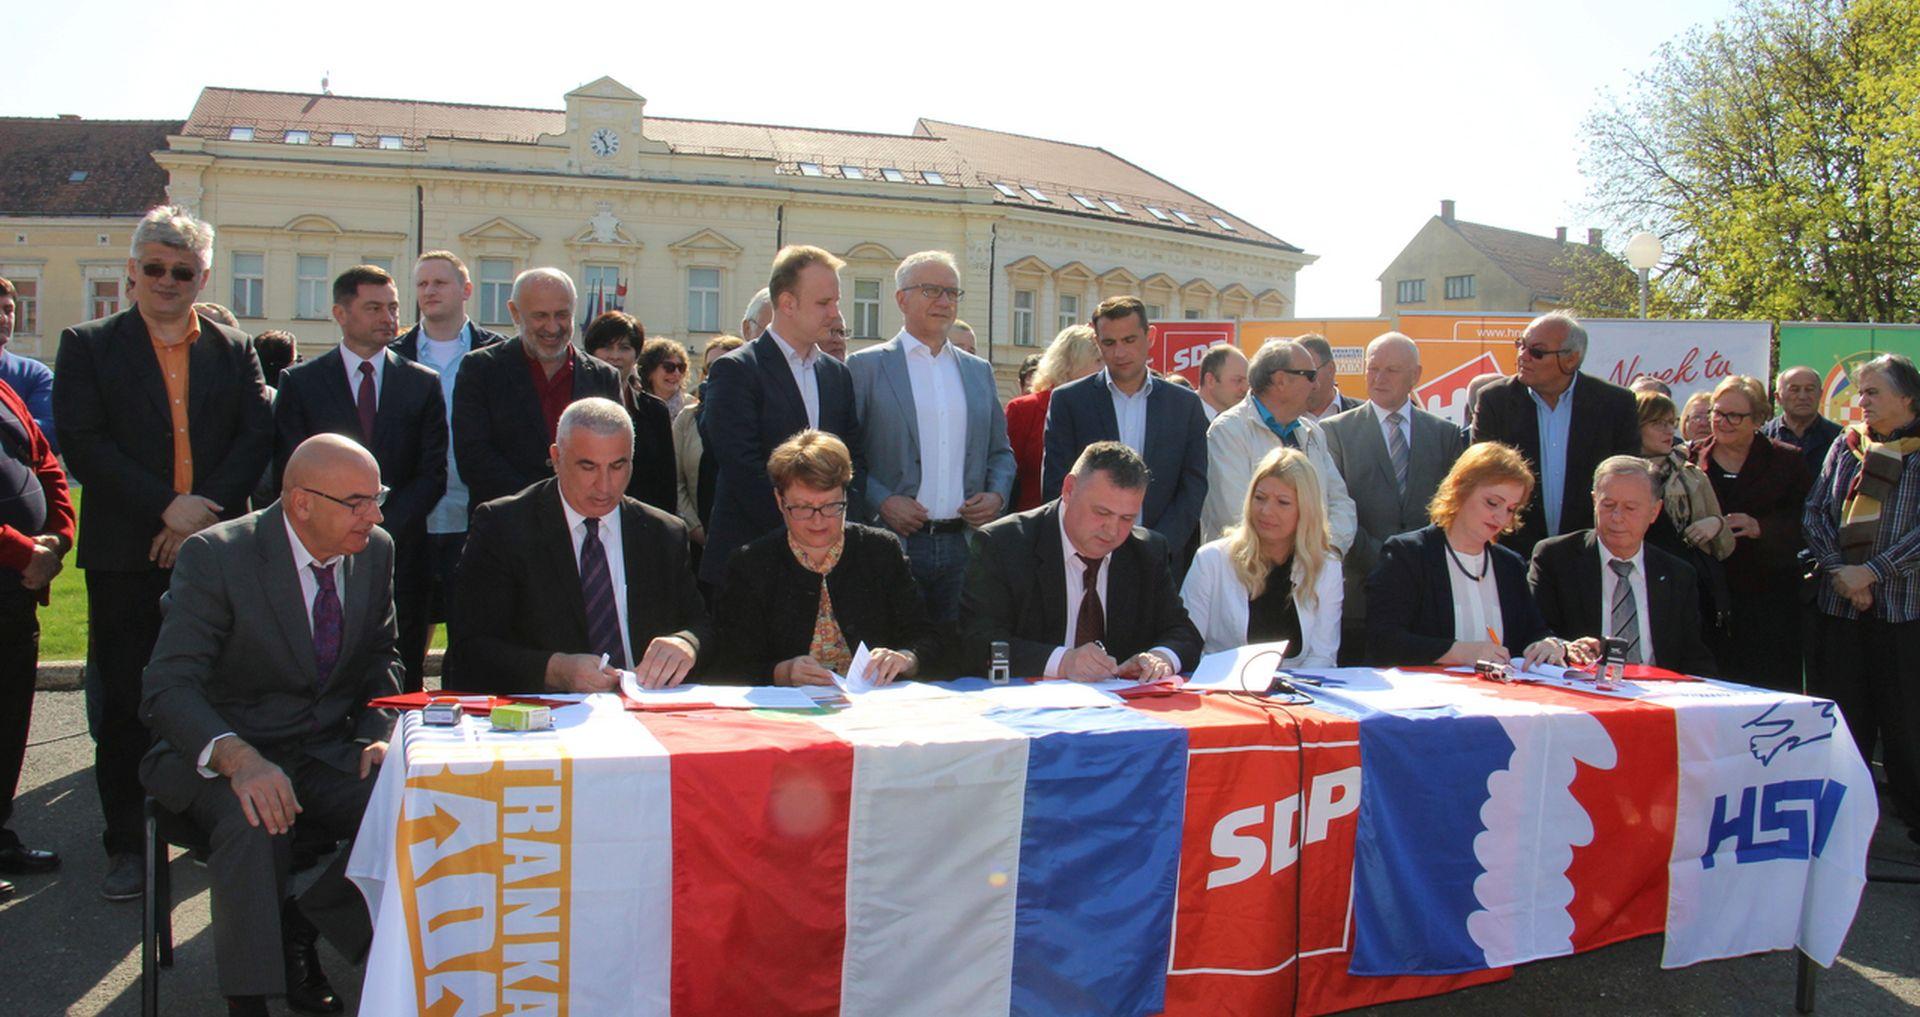 Potpisan koalicijski sporazum SDP-a, HSS-a, HNS-a, HSU-a i Hrvatskih laburista